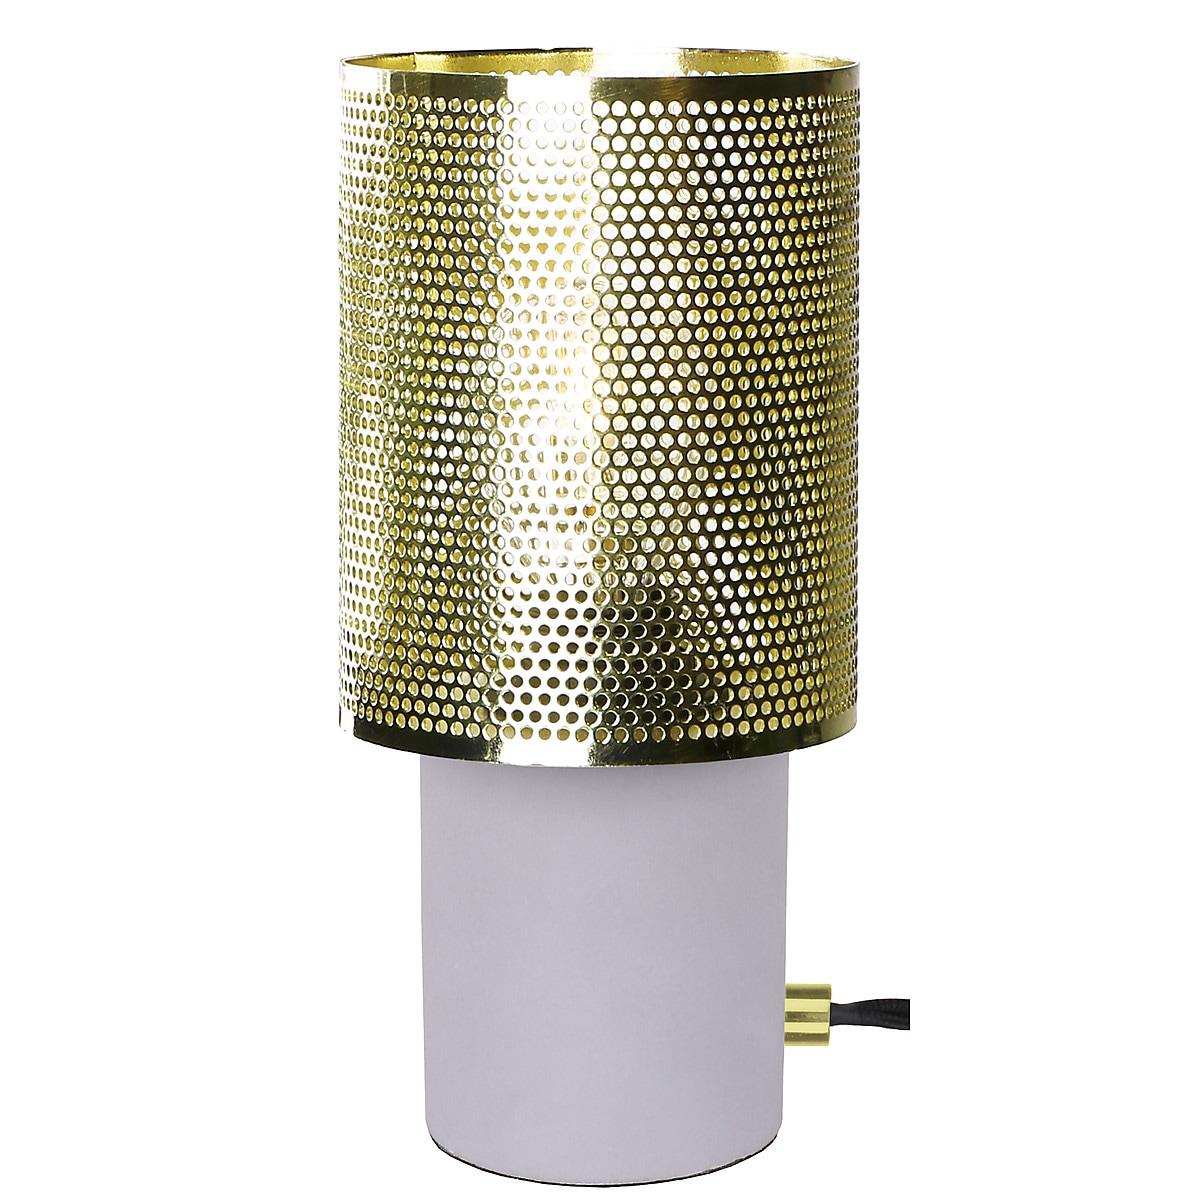 Bordslampa Rumble Globen Lighting